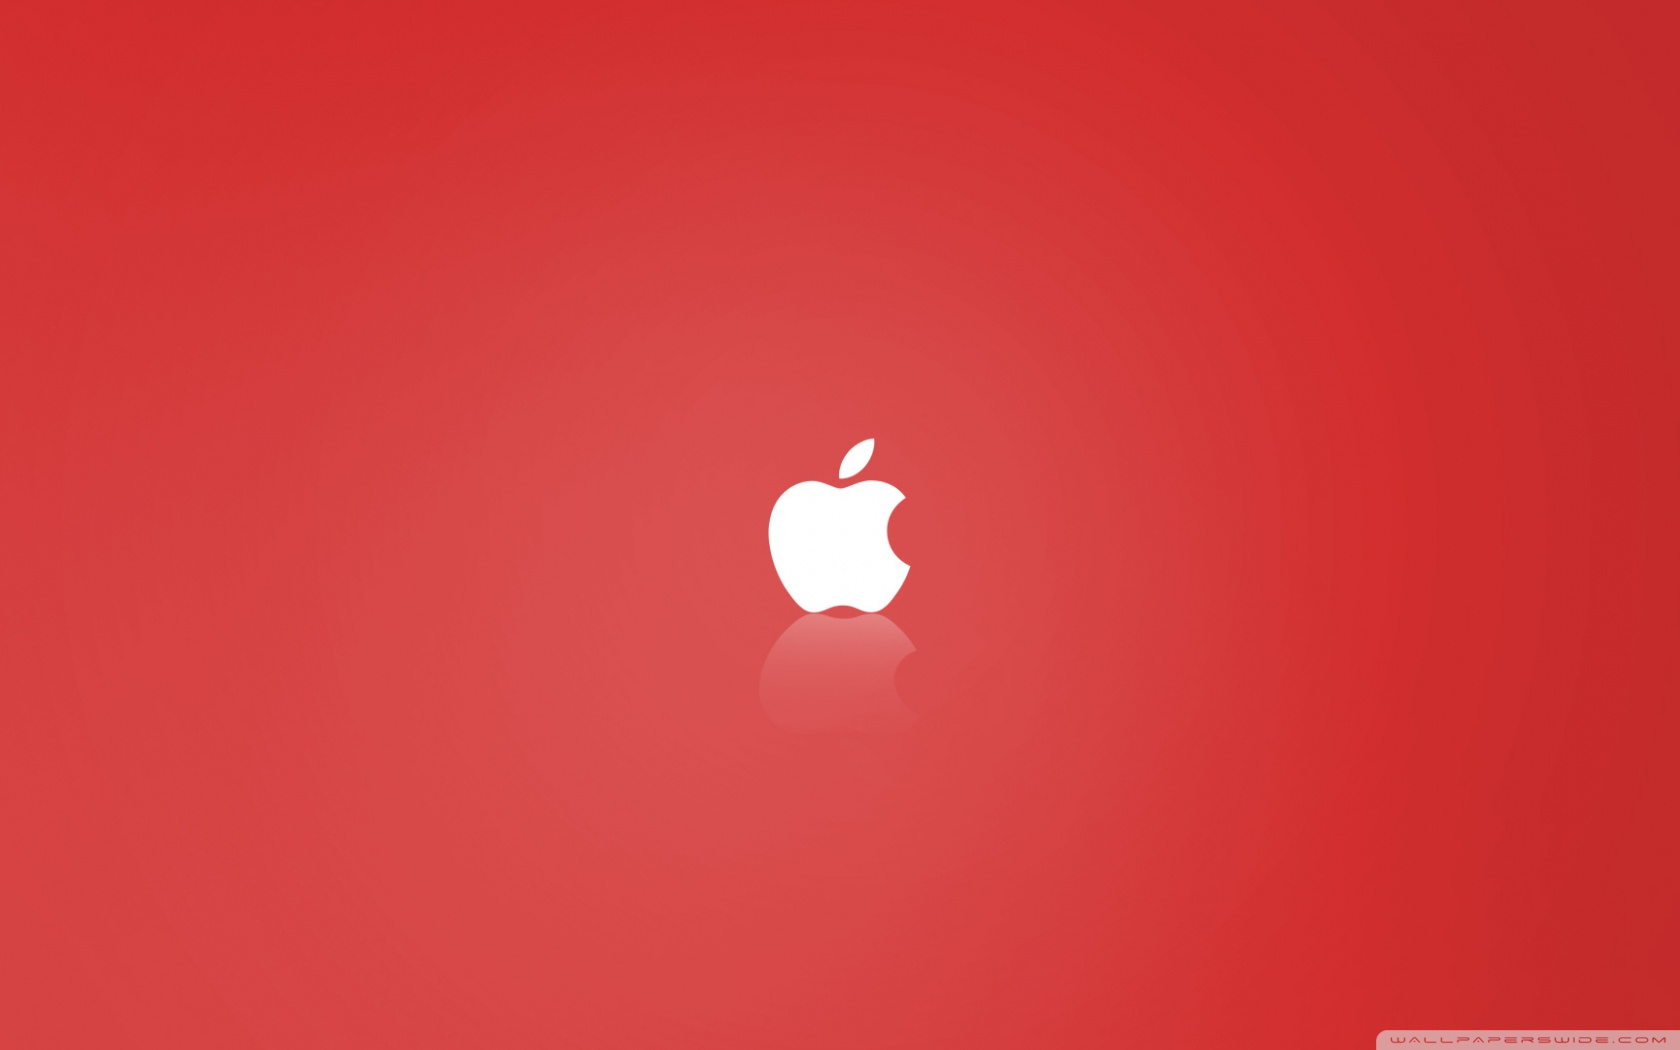 Free Download Apple Mac Os X Red 4k Hd Desktop Wallpaper For